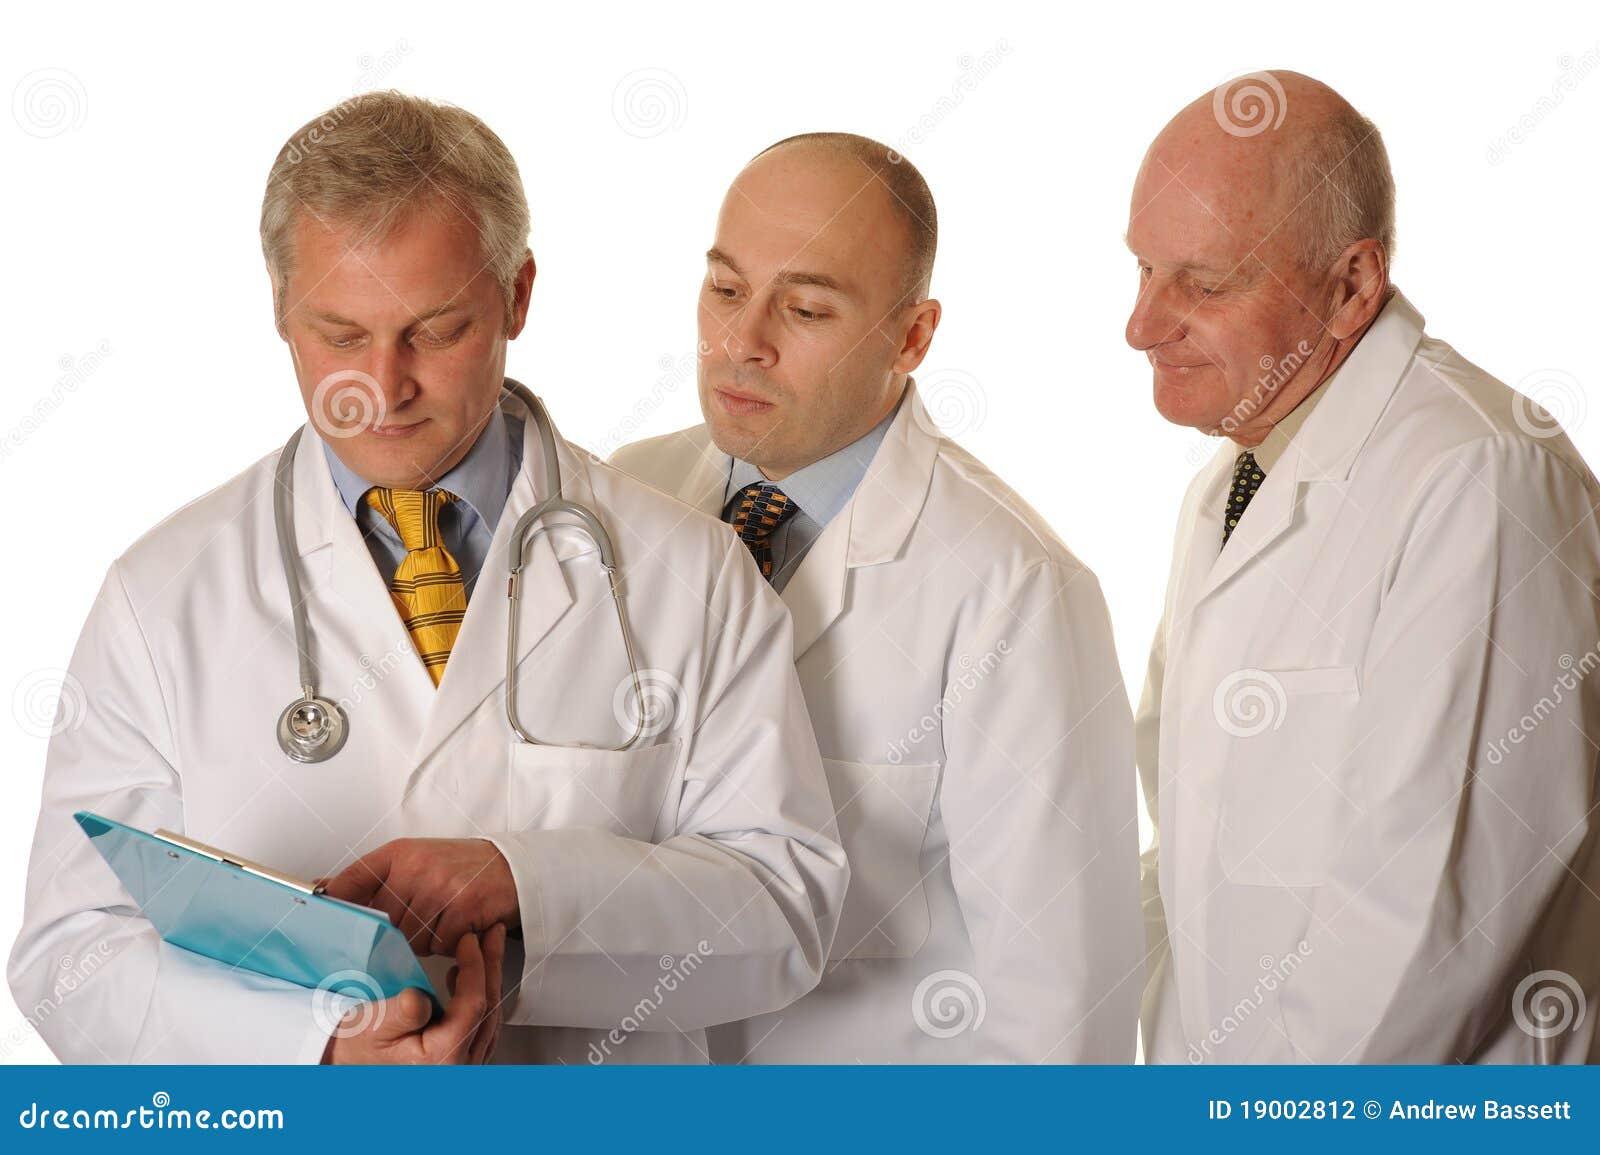 u-doktora-smotret